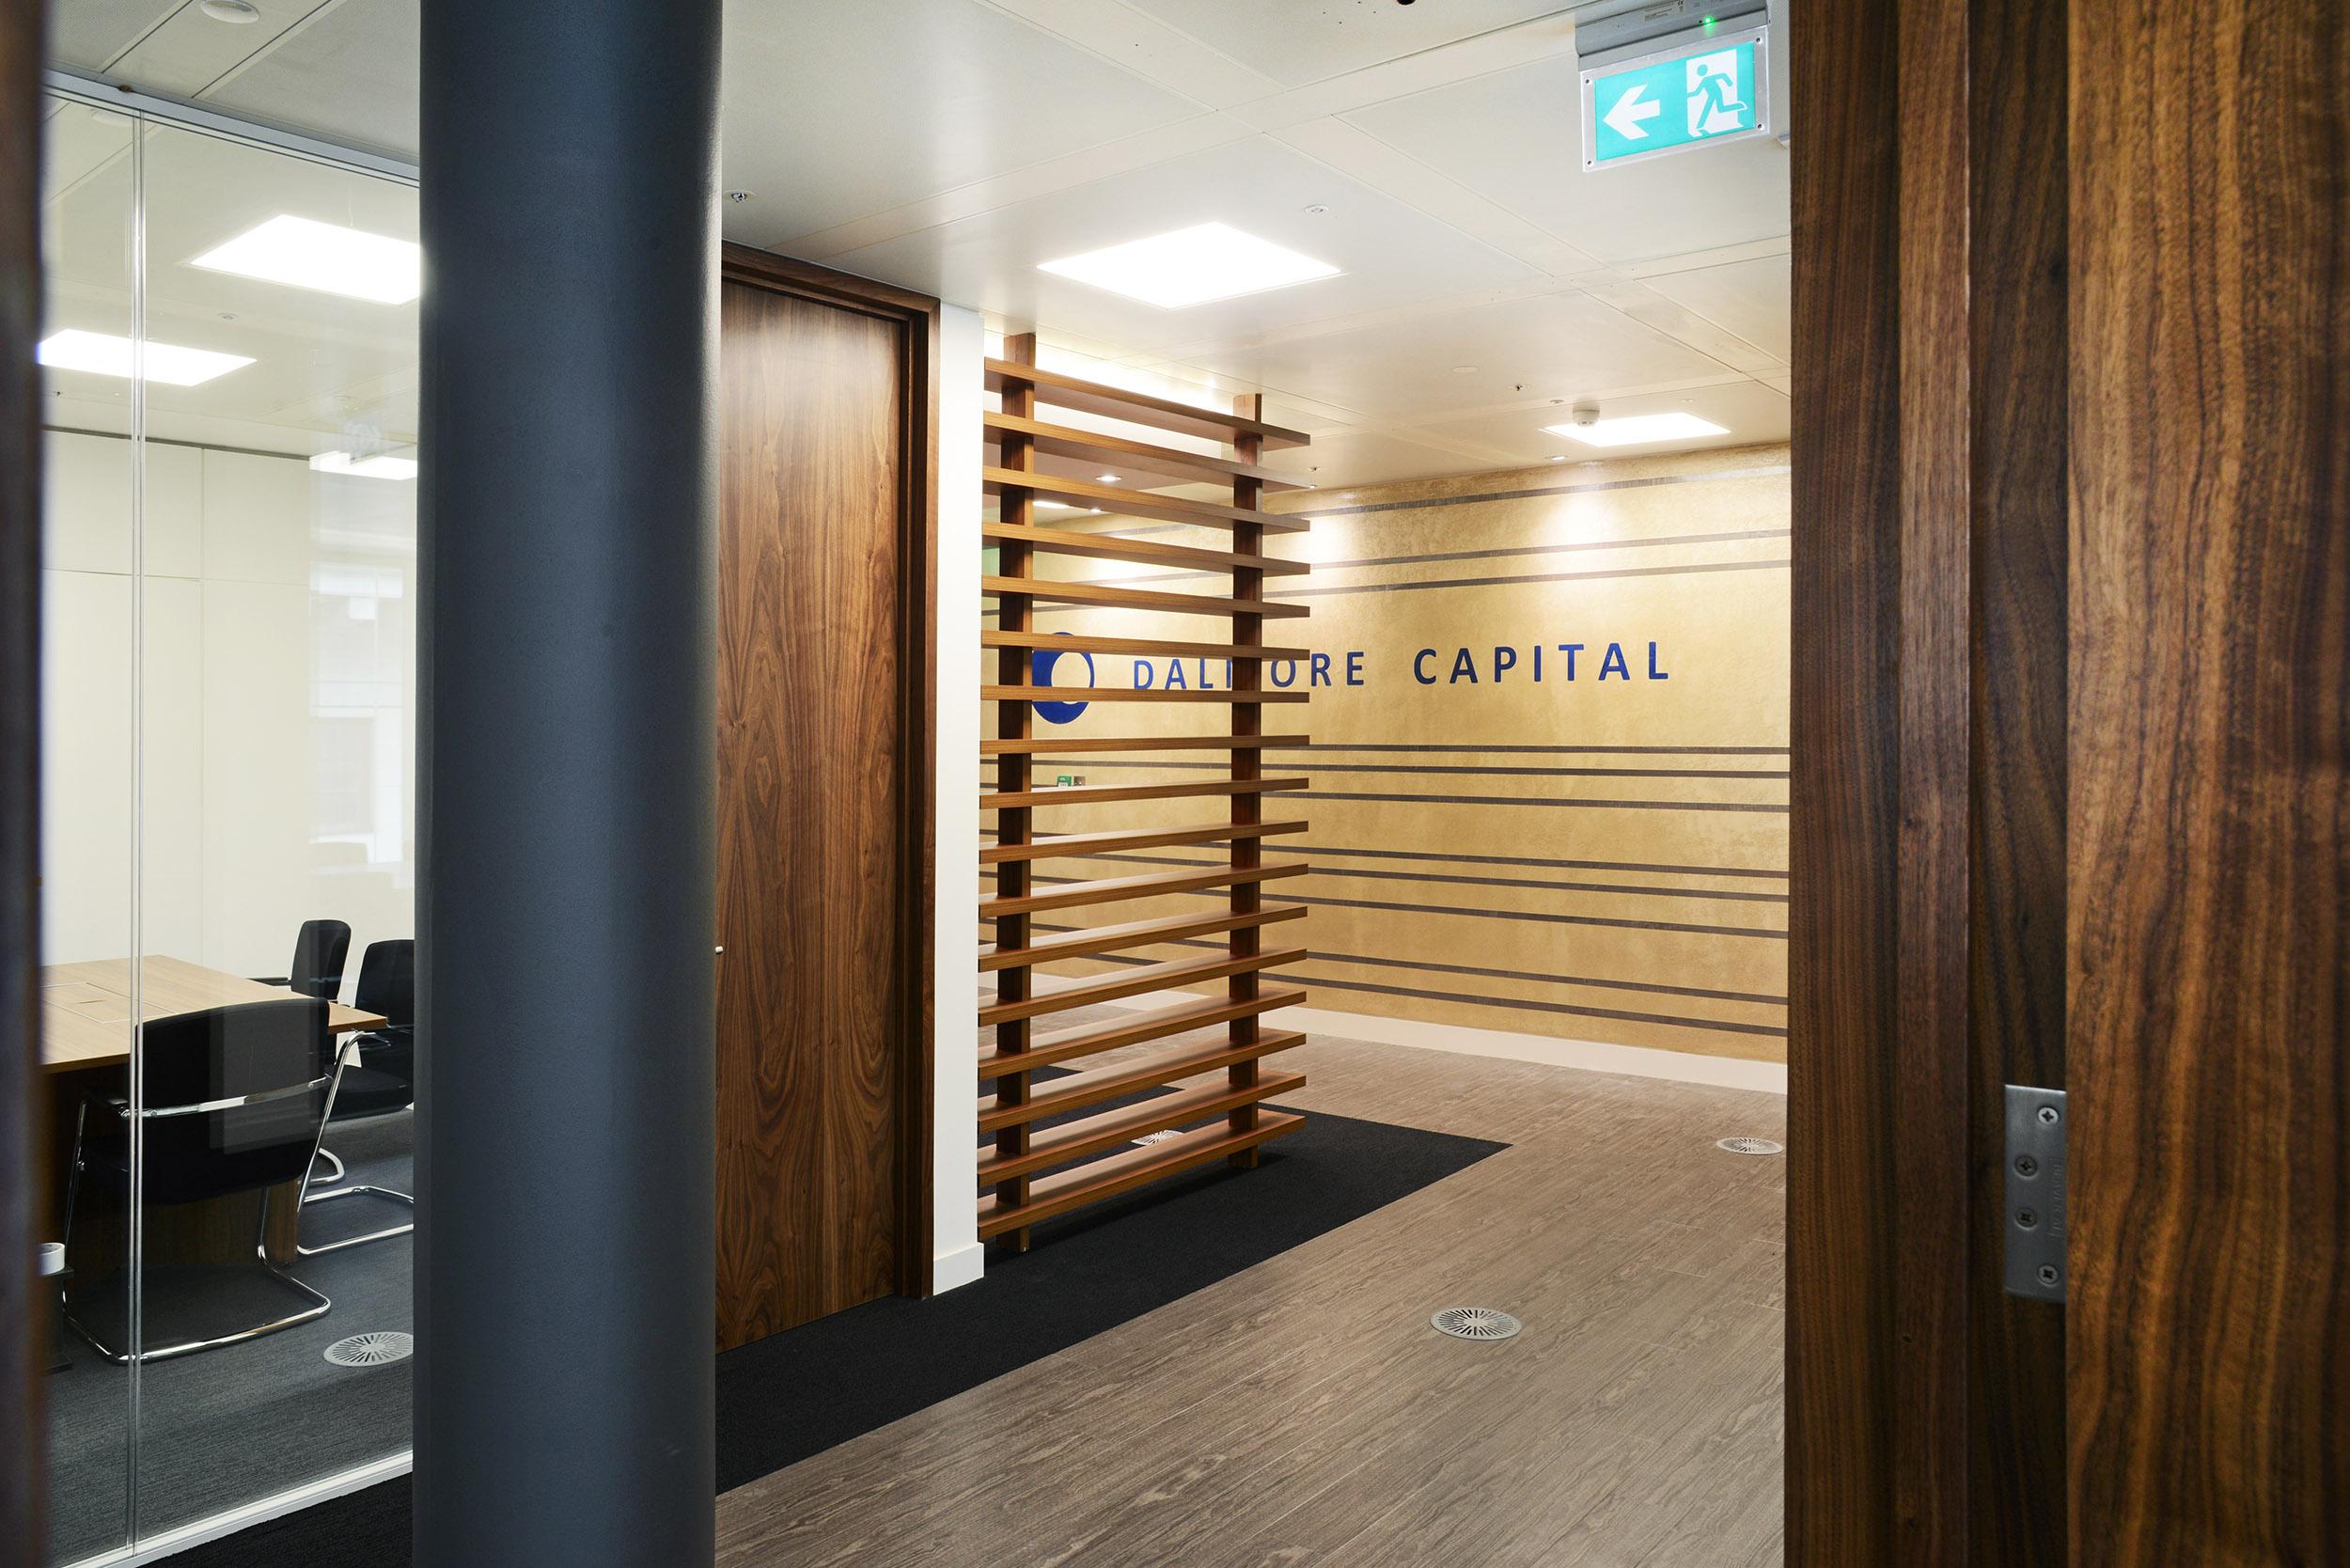 Dalmore Capital 5,500 Sq ft – 7 Weeks